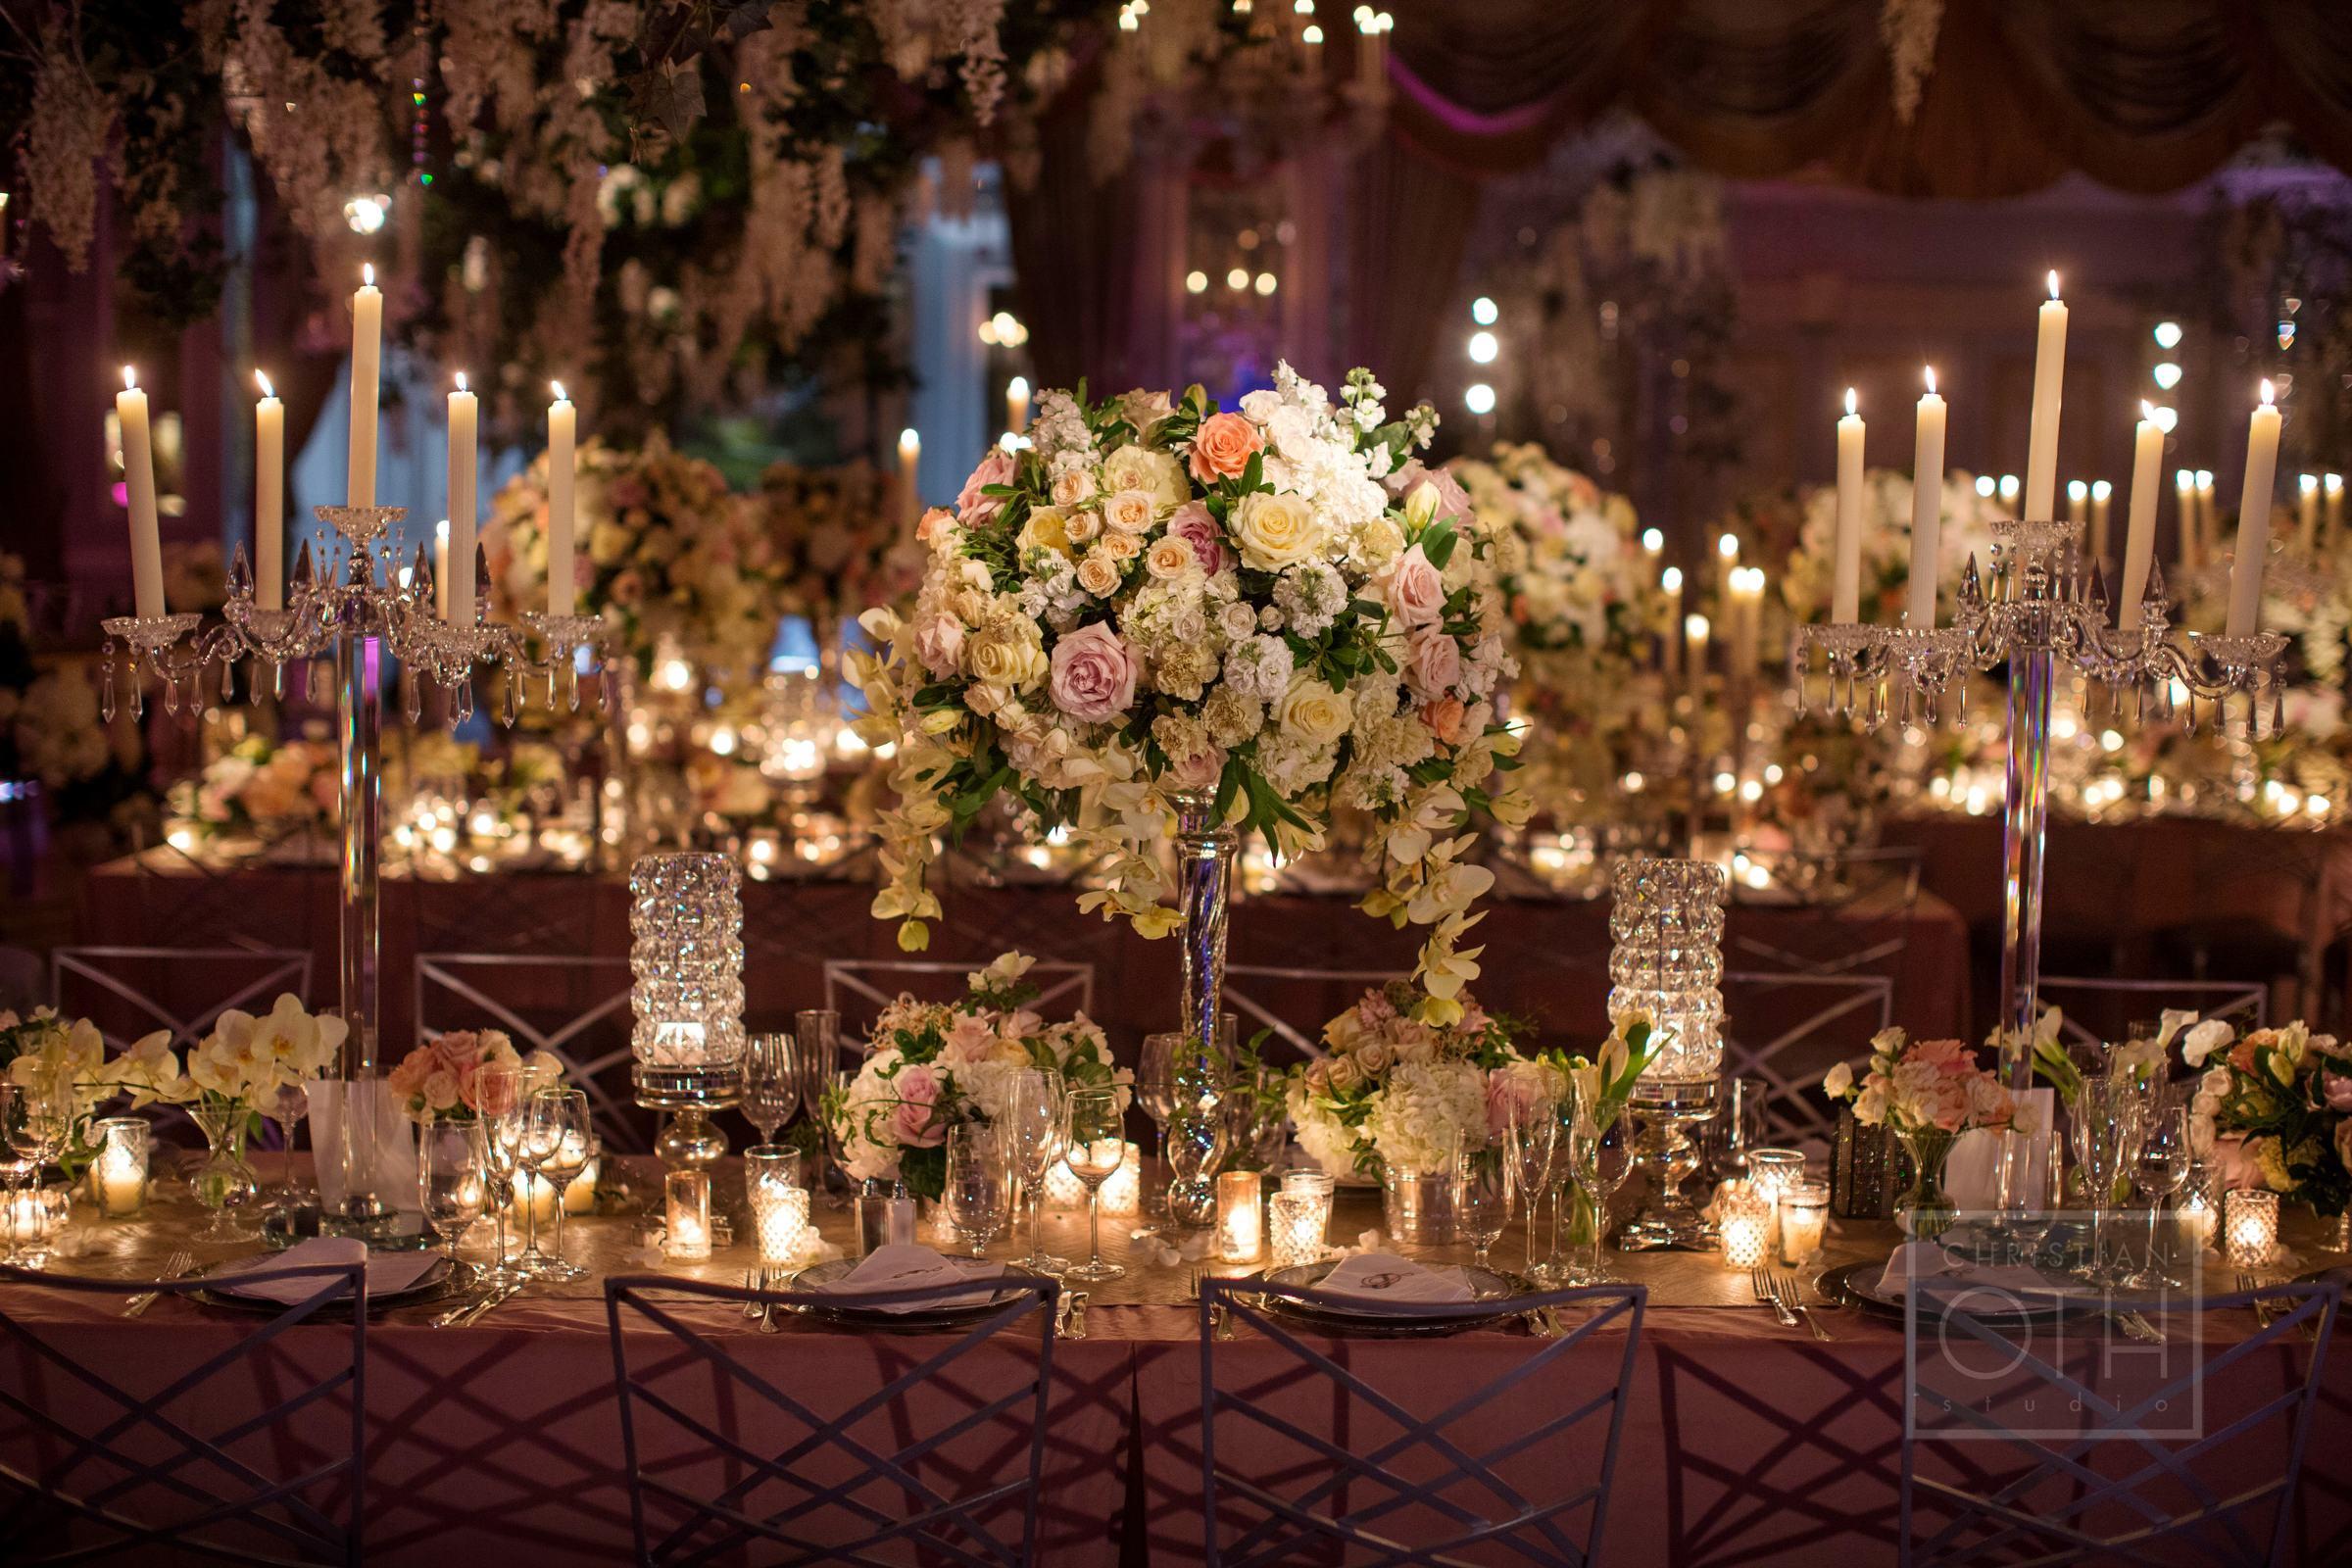 Ceci_New_York_Custom_Invitation_Pierre__City_ Destination_Wedding_Luxury_Personalized_Ceci_Style_Bride_Rose_Gold_Foil_Stamping129.JPG